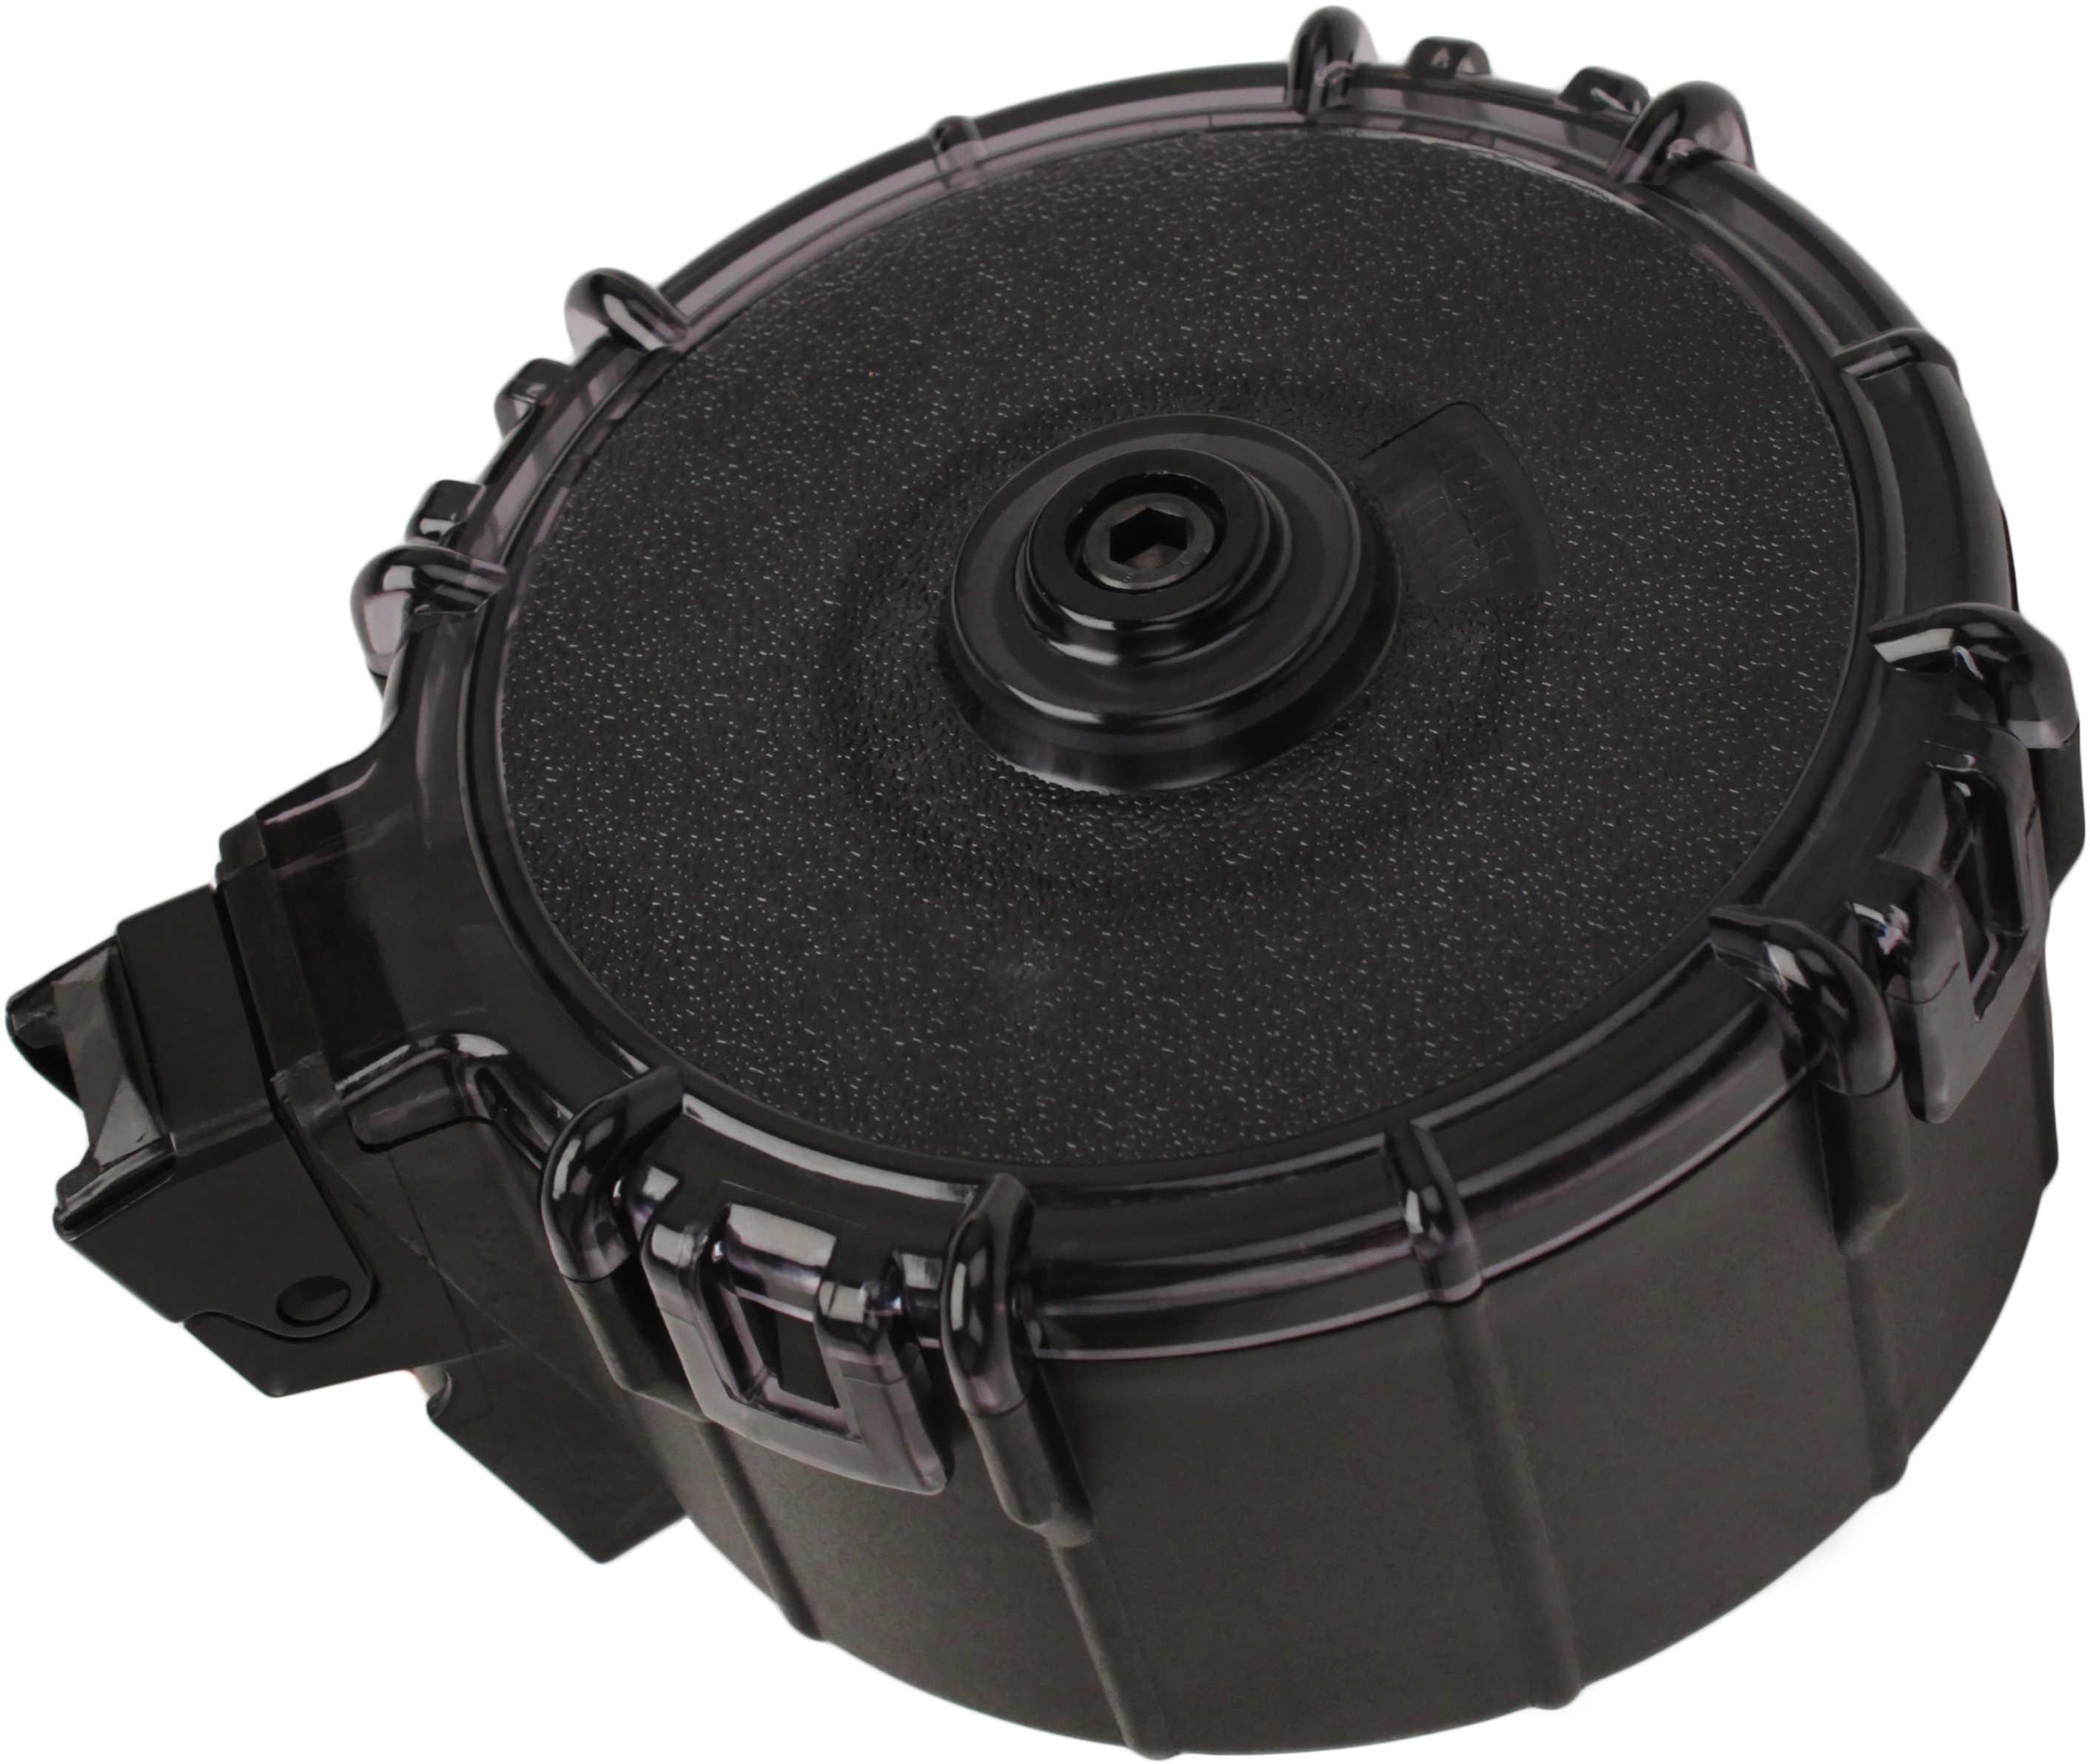 Promag SAIGa 12 Gauge Black Poly 15Rd Drum